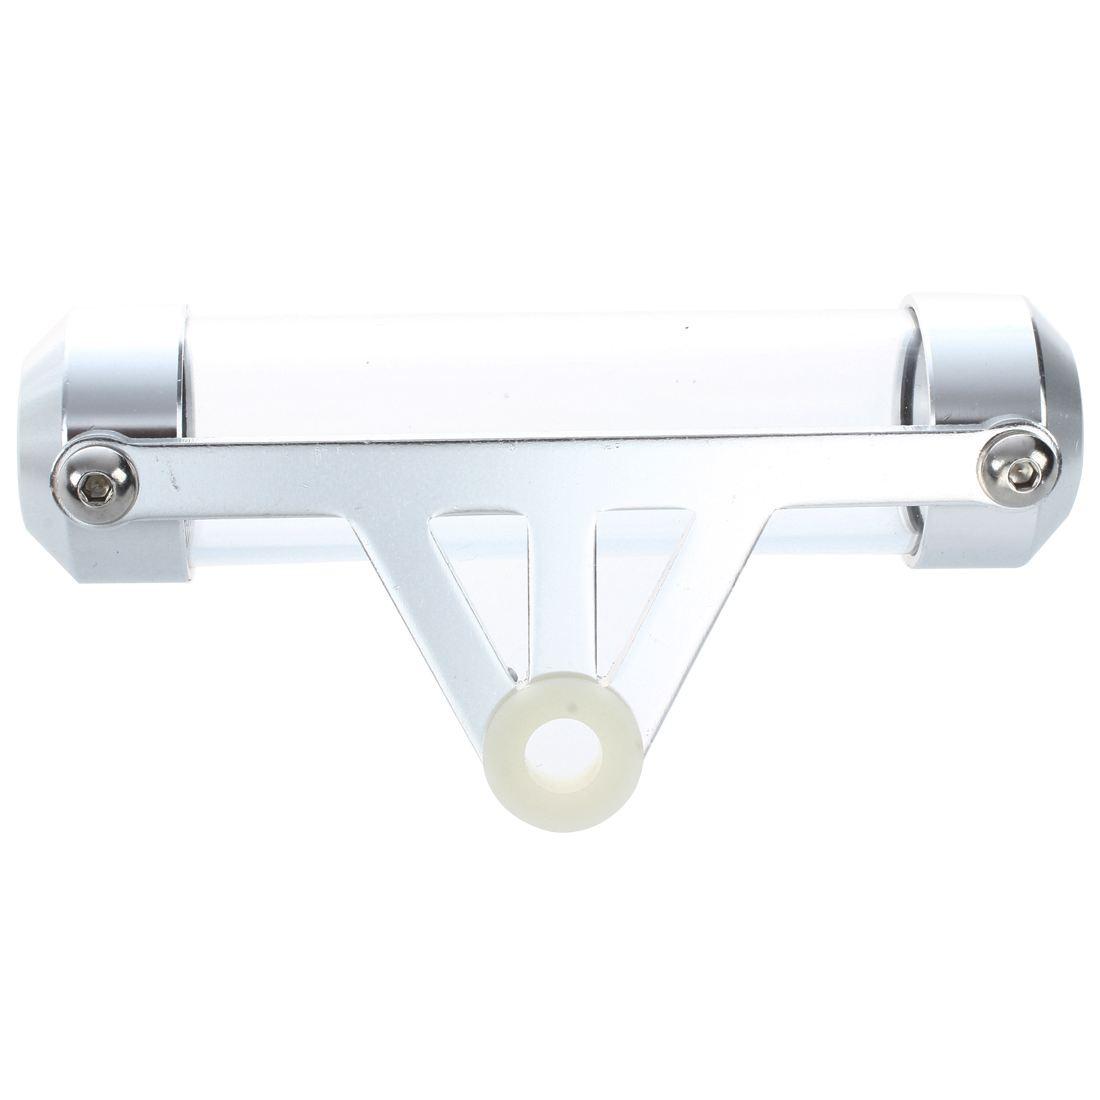 Soporte-tubo-disco-impuesto-metal-Moto-Scooter-Motocicleta-Ciclomotor-ImpermO6X2 miniatura 5